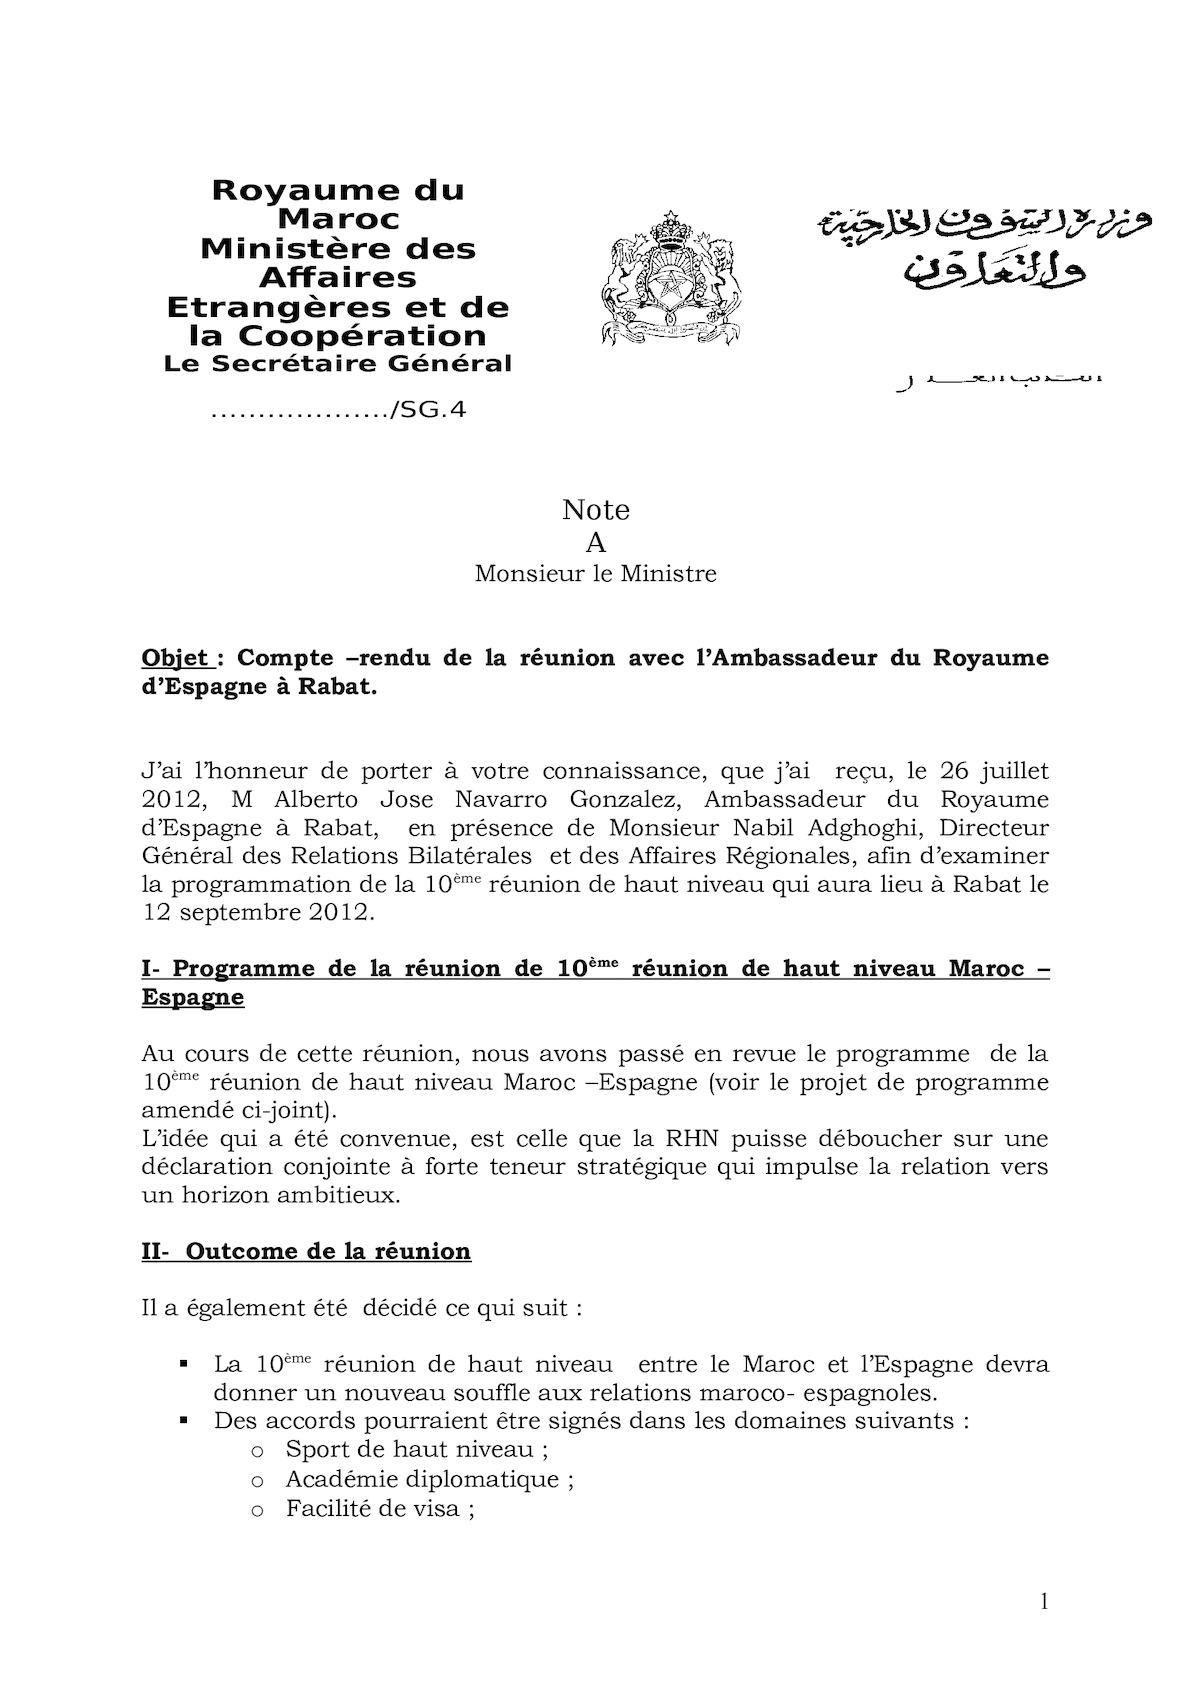 Maroc Espagne 10ème Rhn